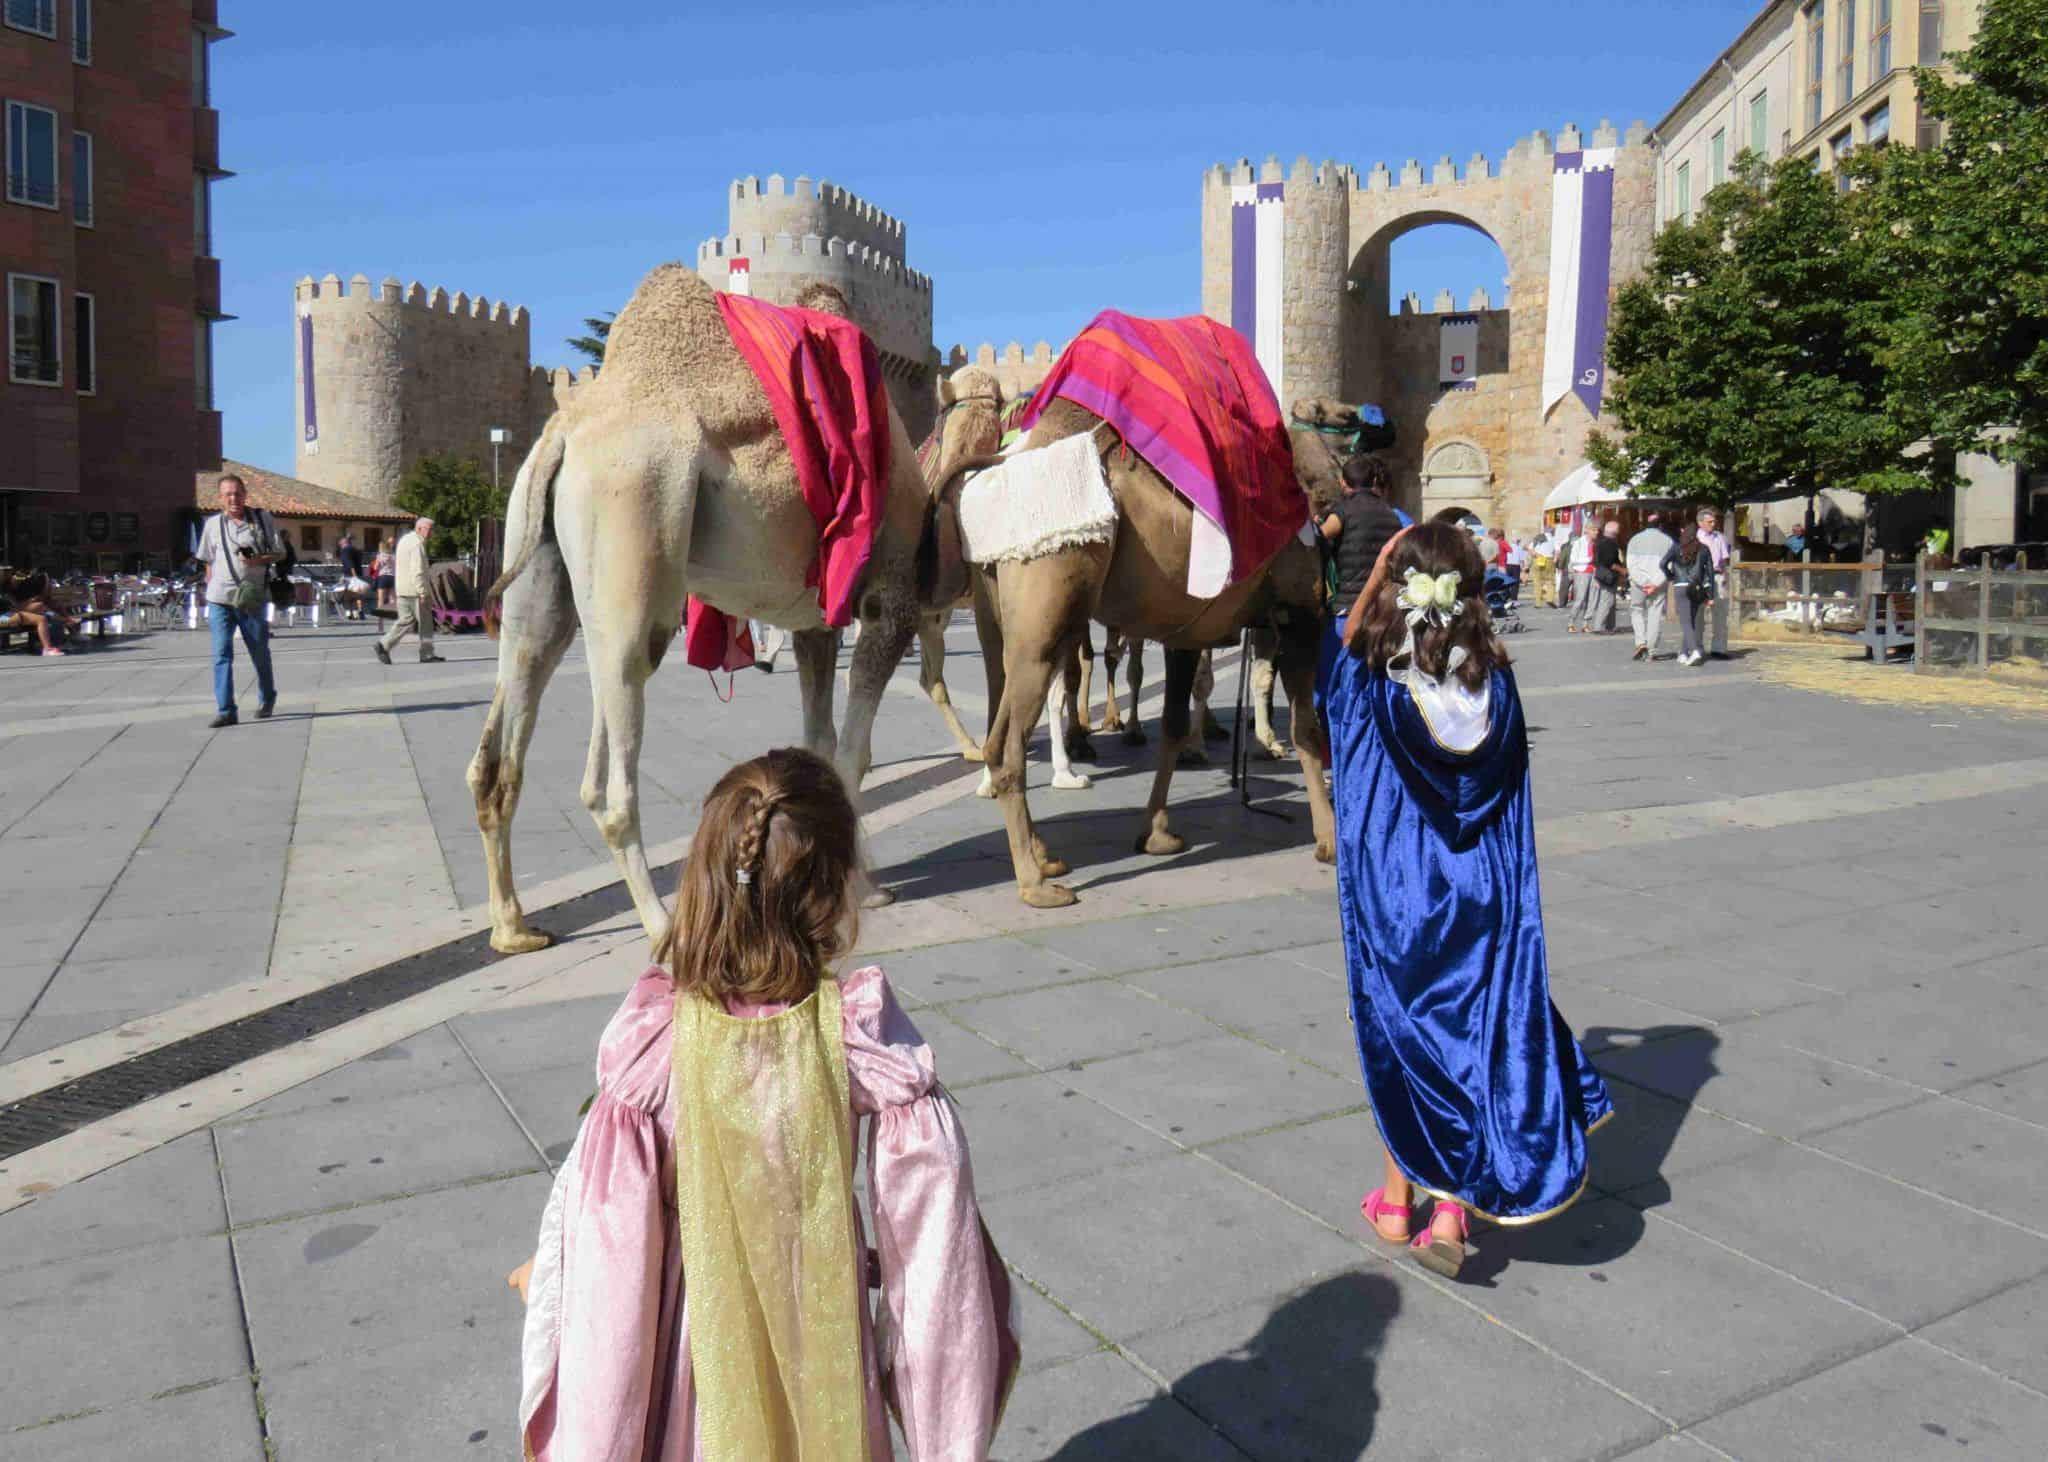 mercado medieval de Ávila 2021